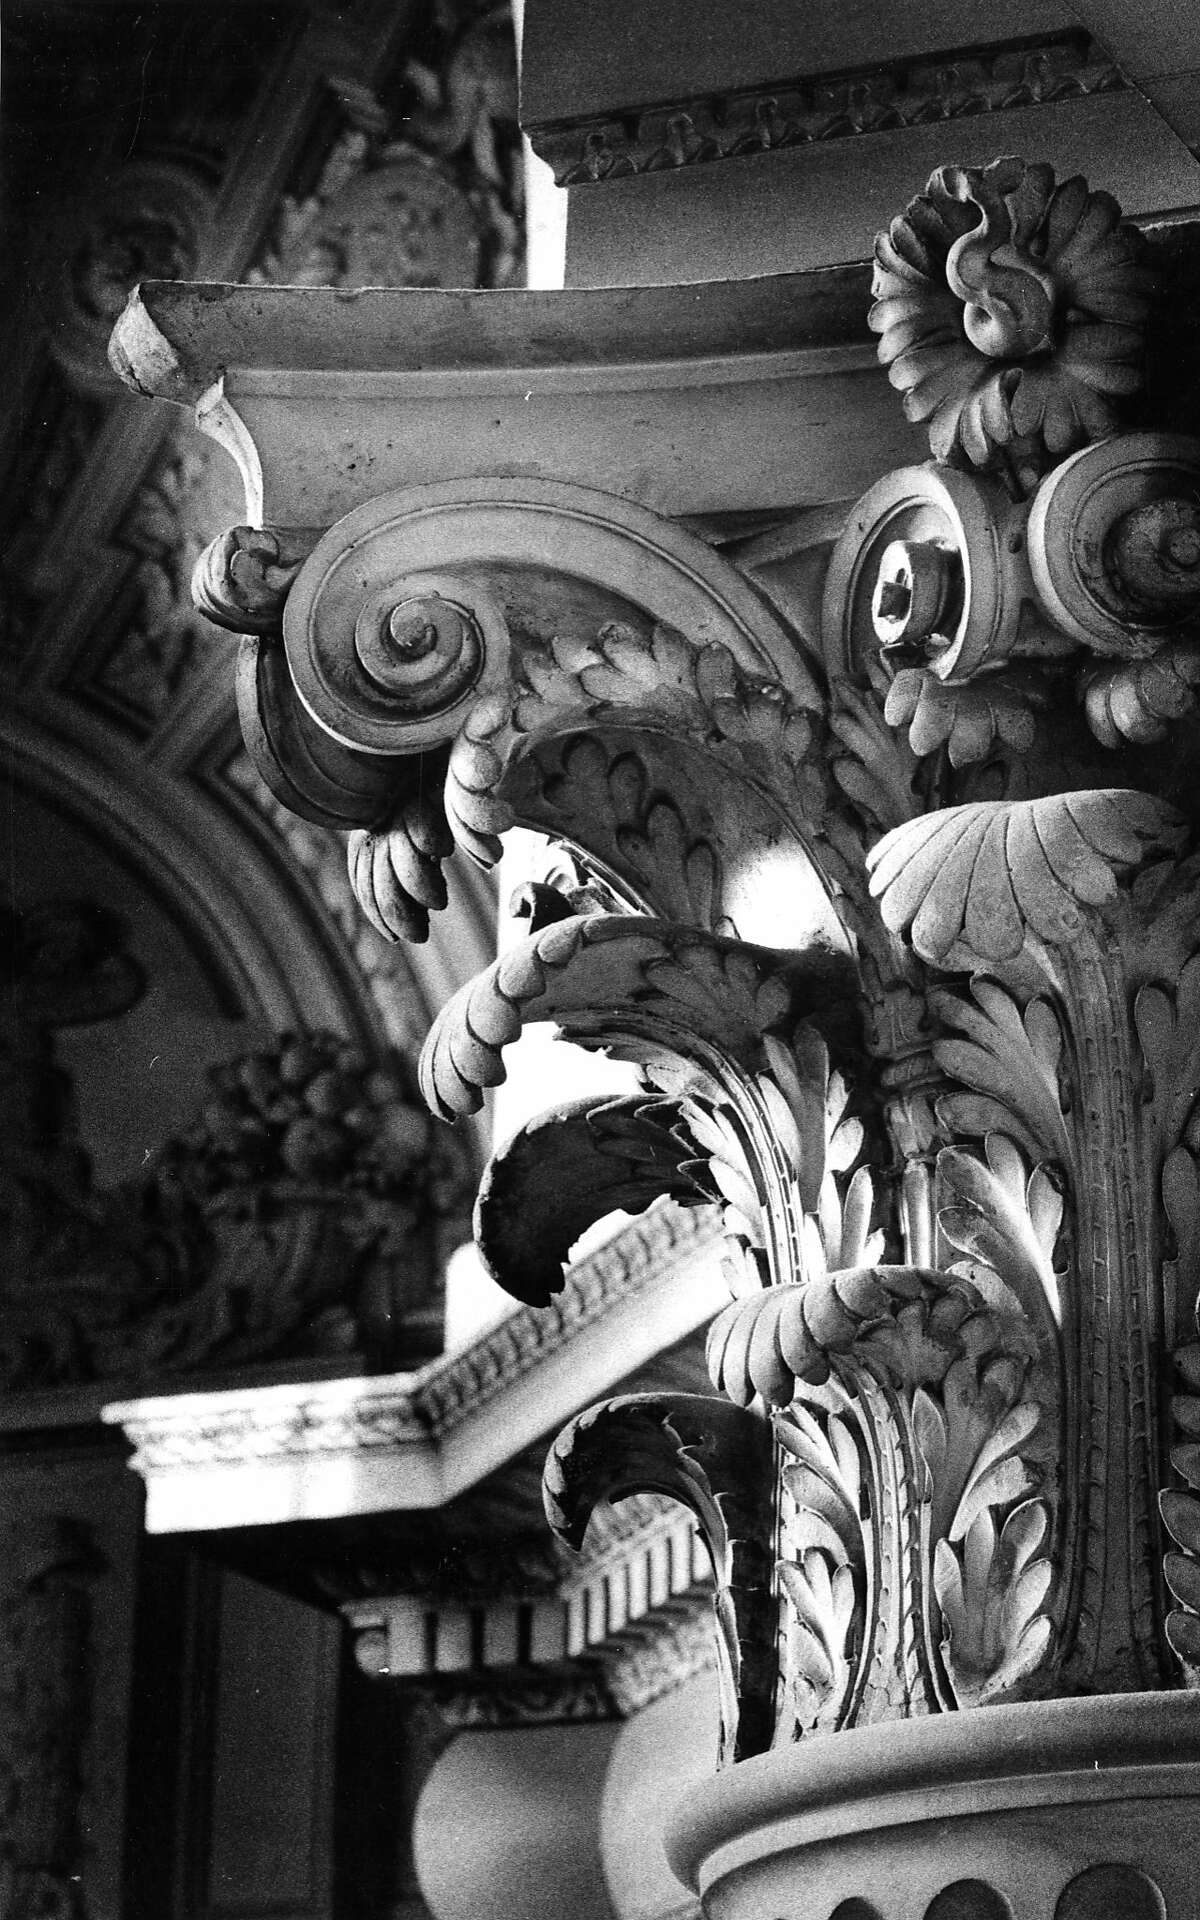 Jan. 10, 1977: A Corinthian column in San Francisco City Hall.